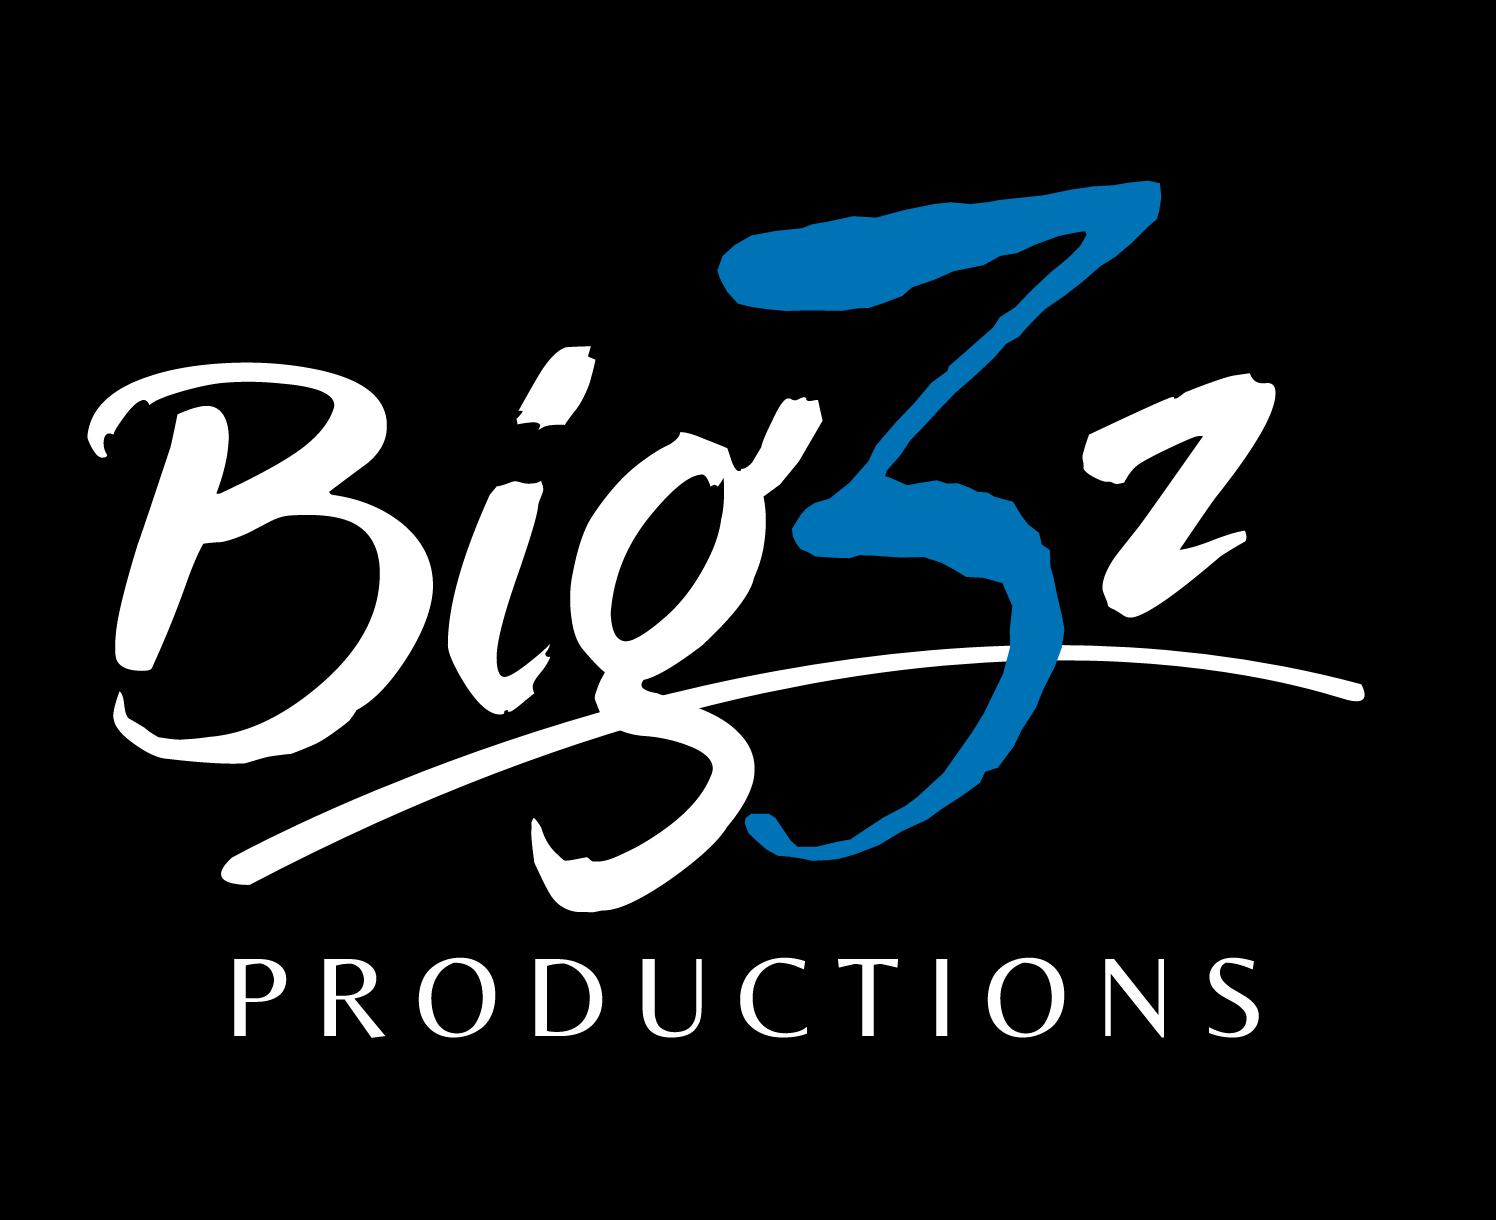 Big3z Productions